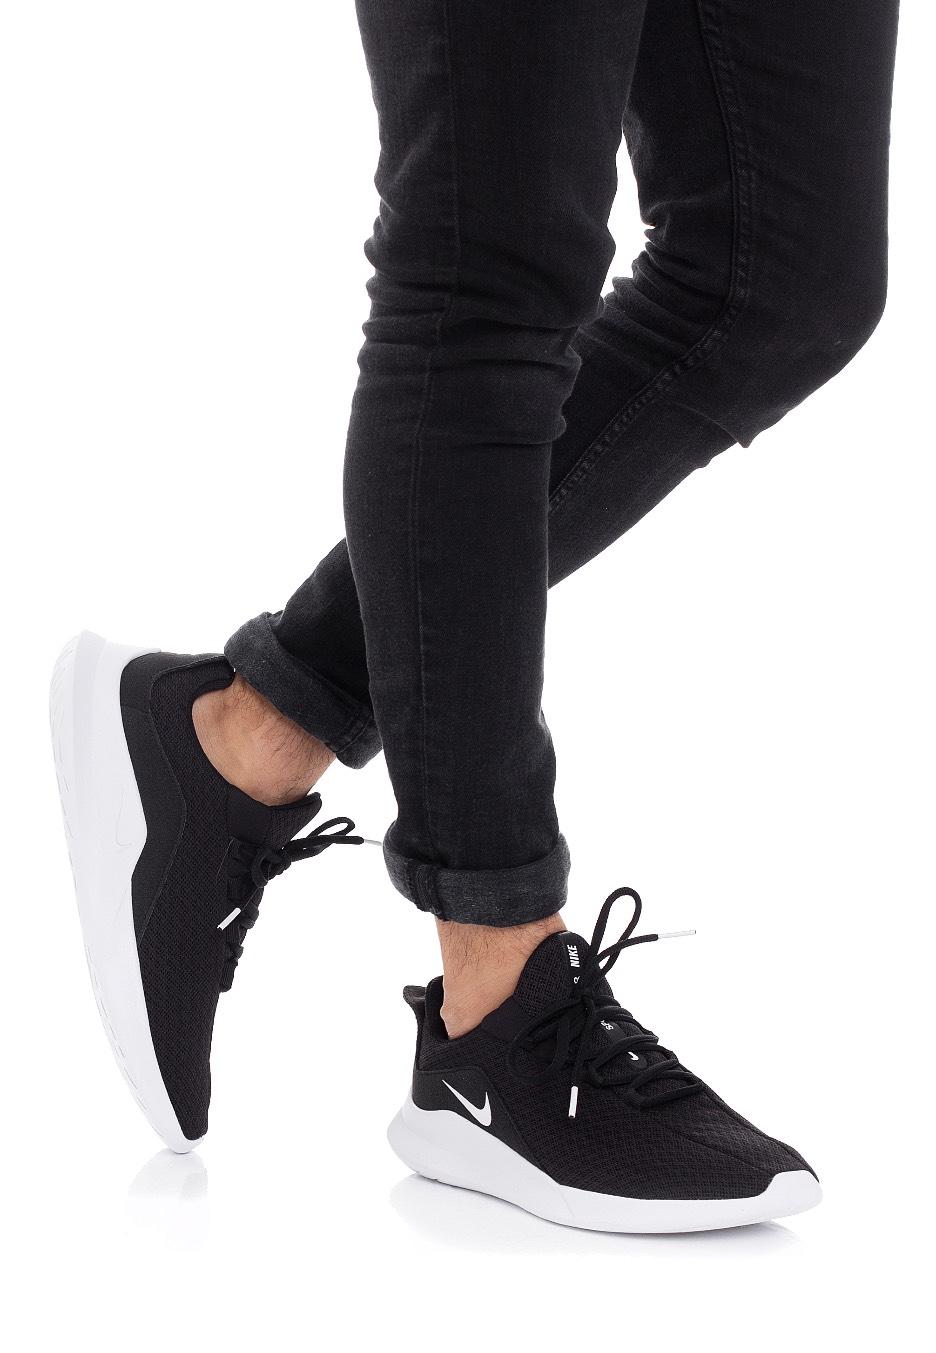 Nike - Viale Black/White - Shoes